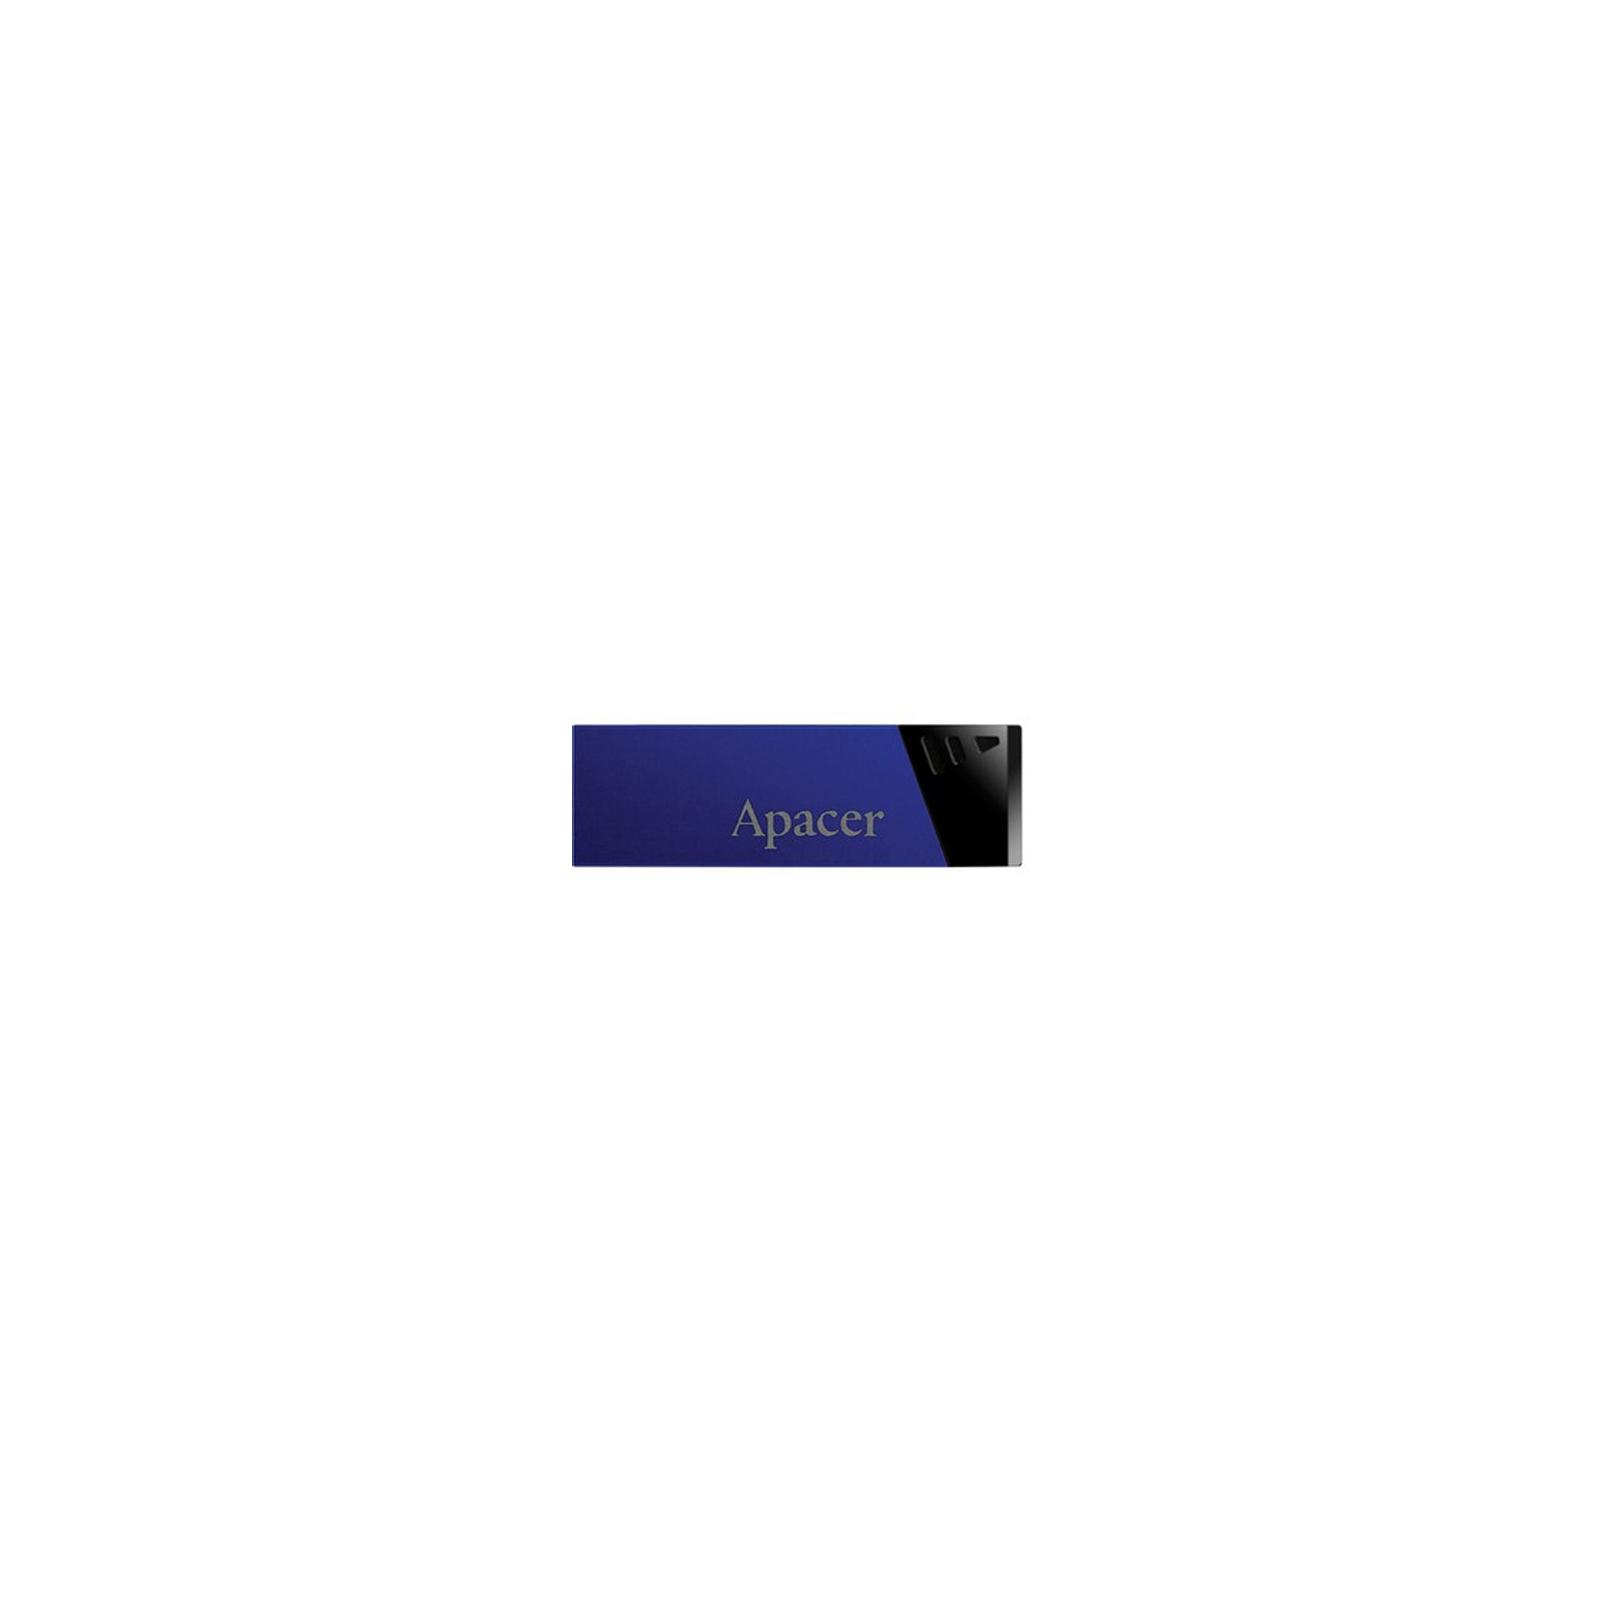 USB флеш накопитель 8GB AH131 Blue RP USB2.0 Apacer (AP8GAH131U-1)